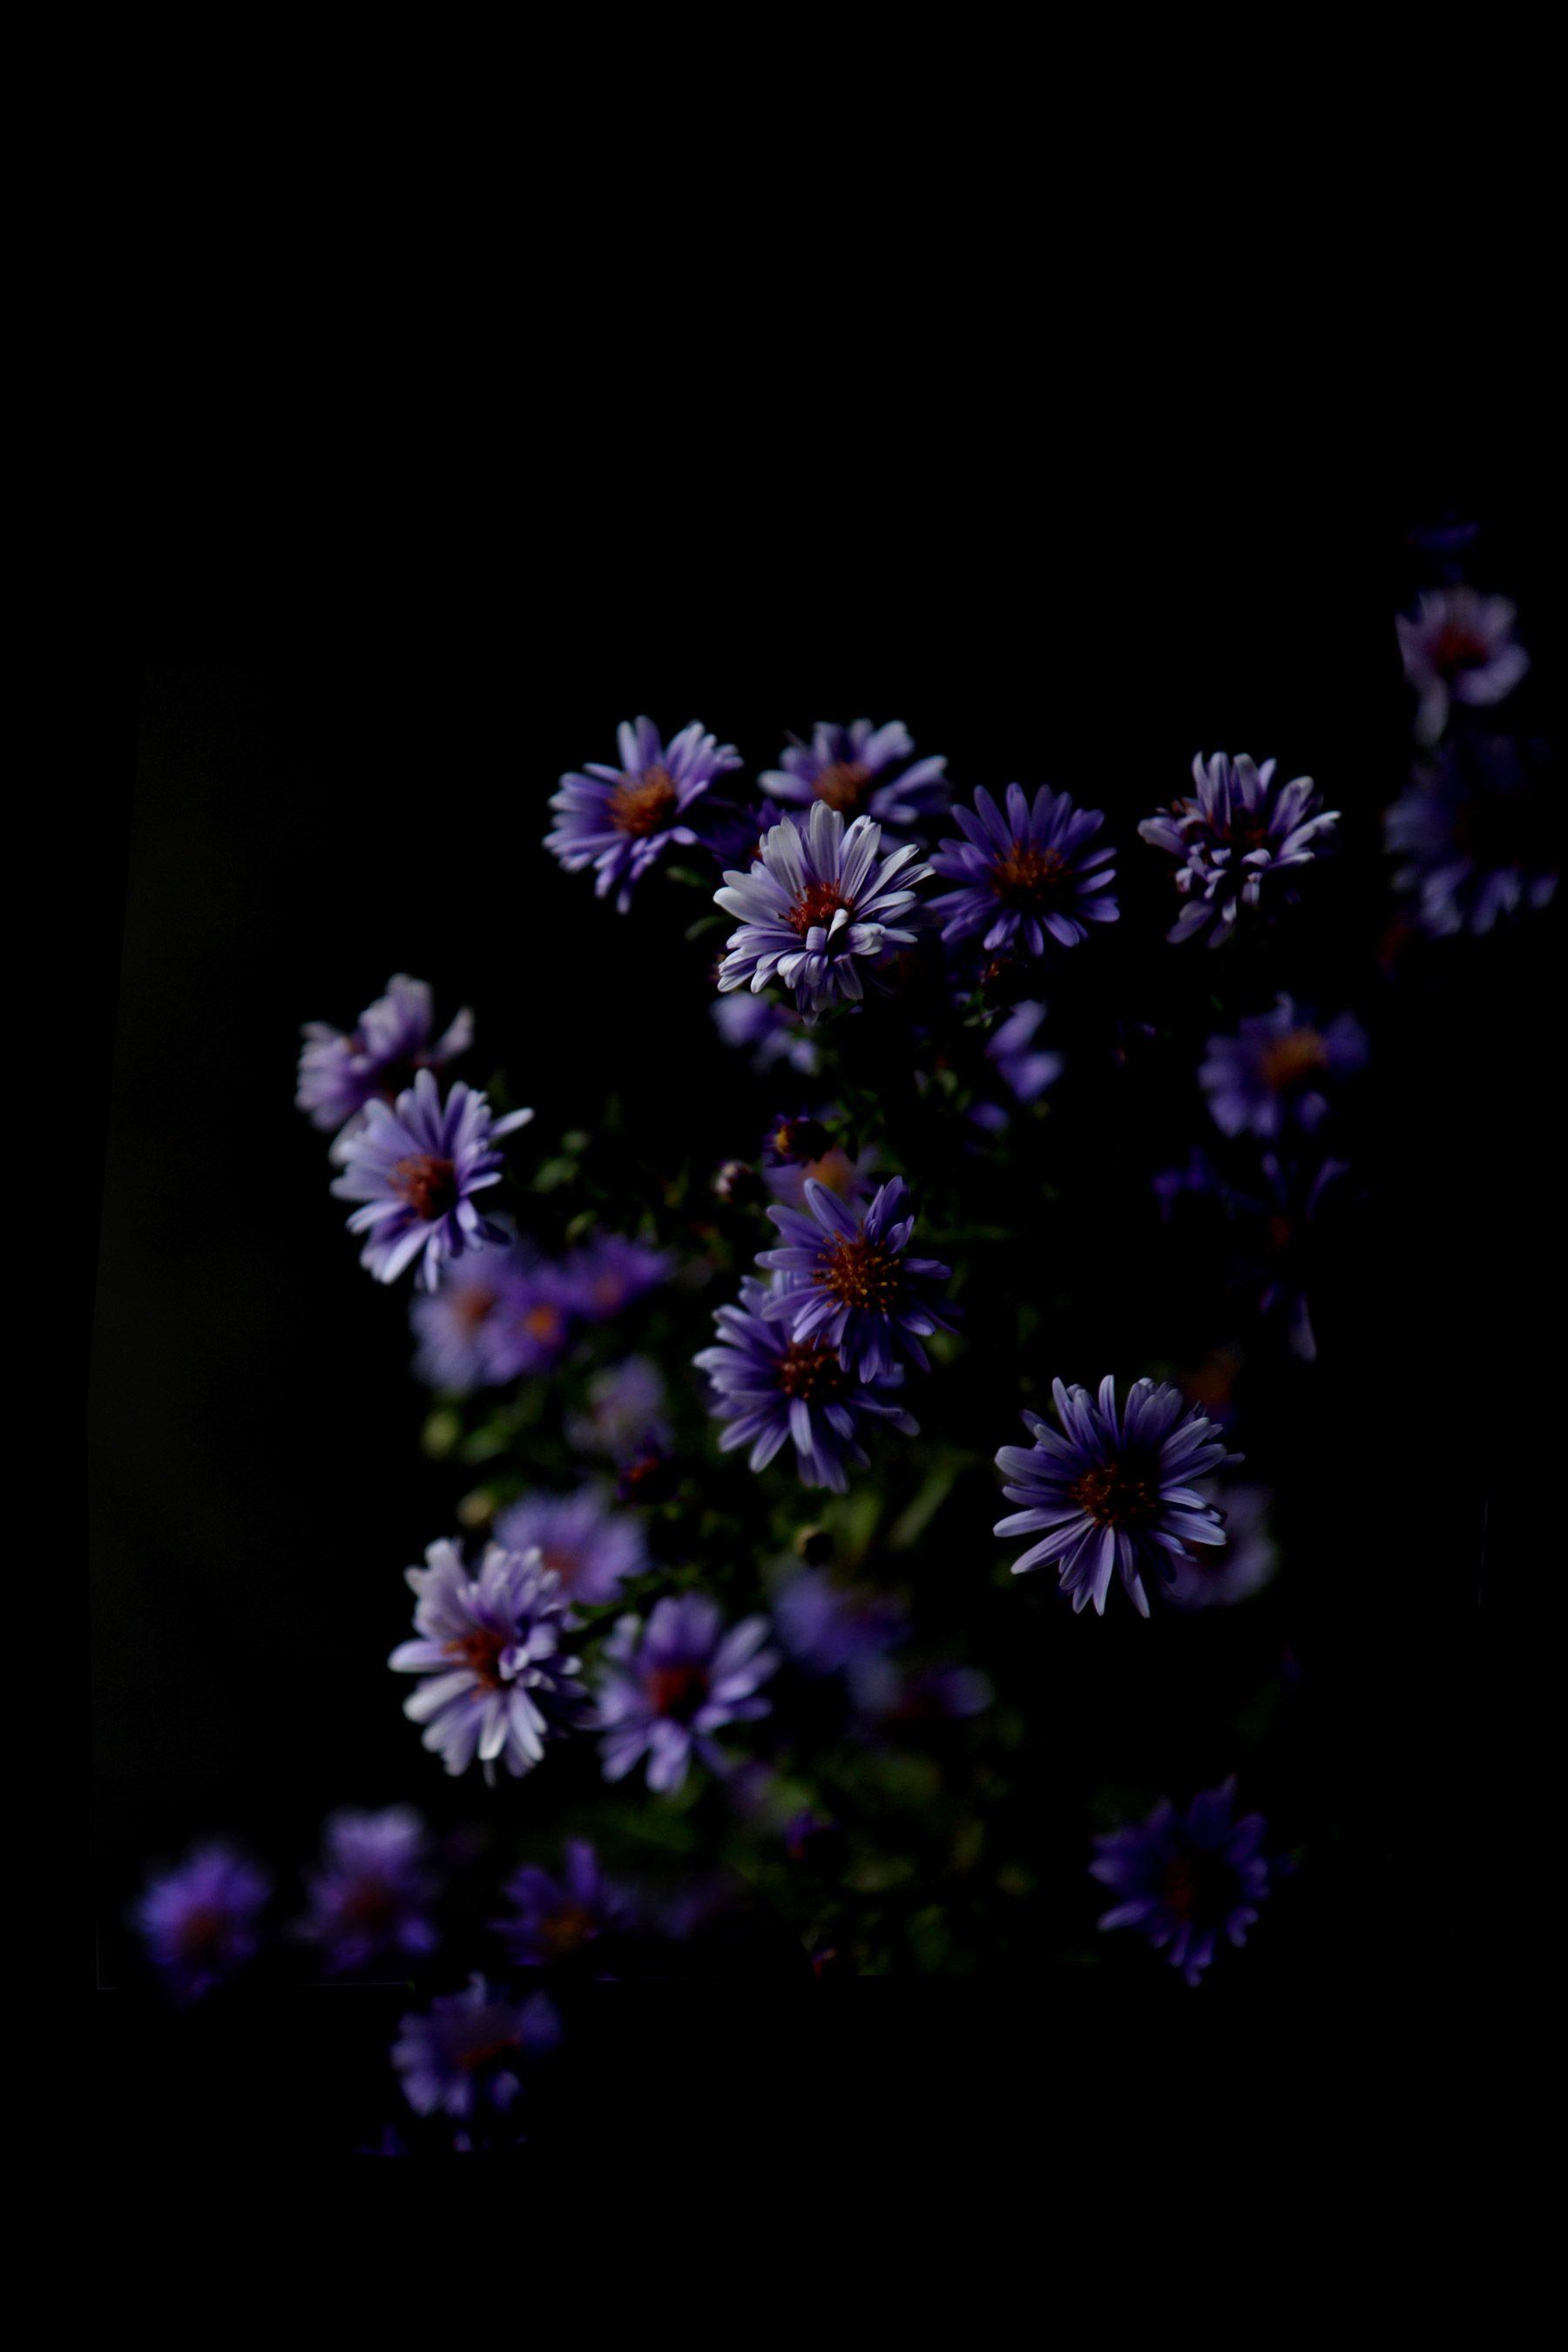 Asters Still Mary Jo Hoffman Flower Background Wallpaper Dark Flowers Black Background Wallpaper